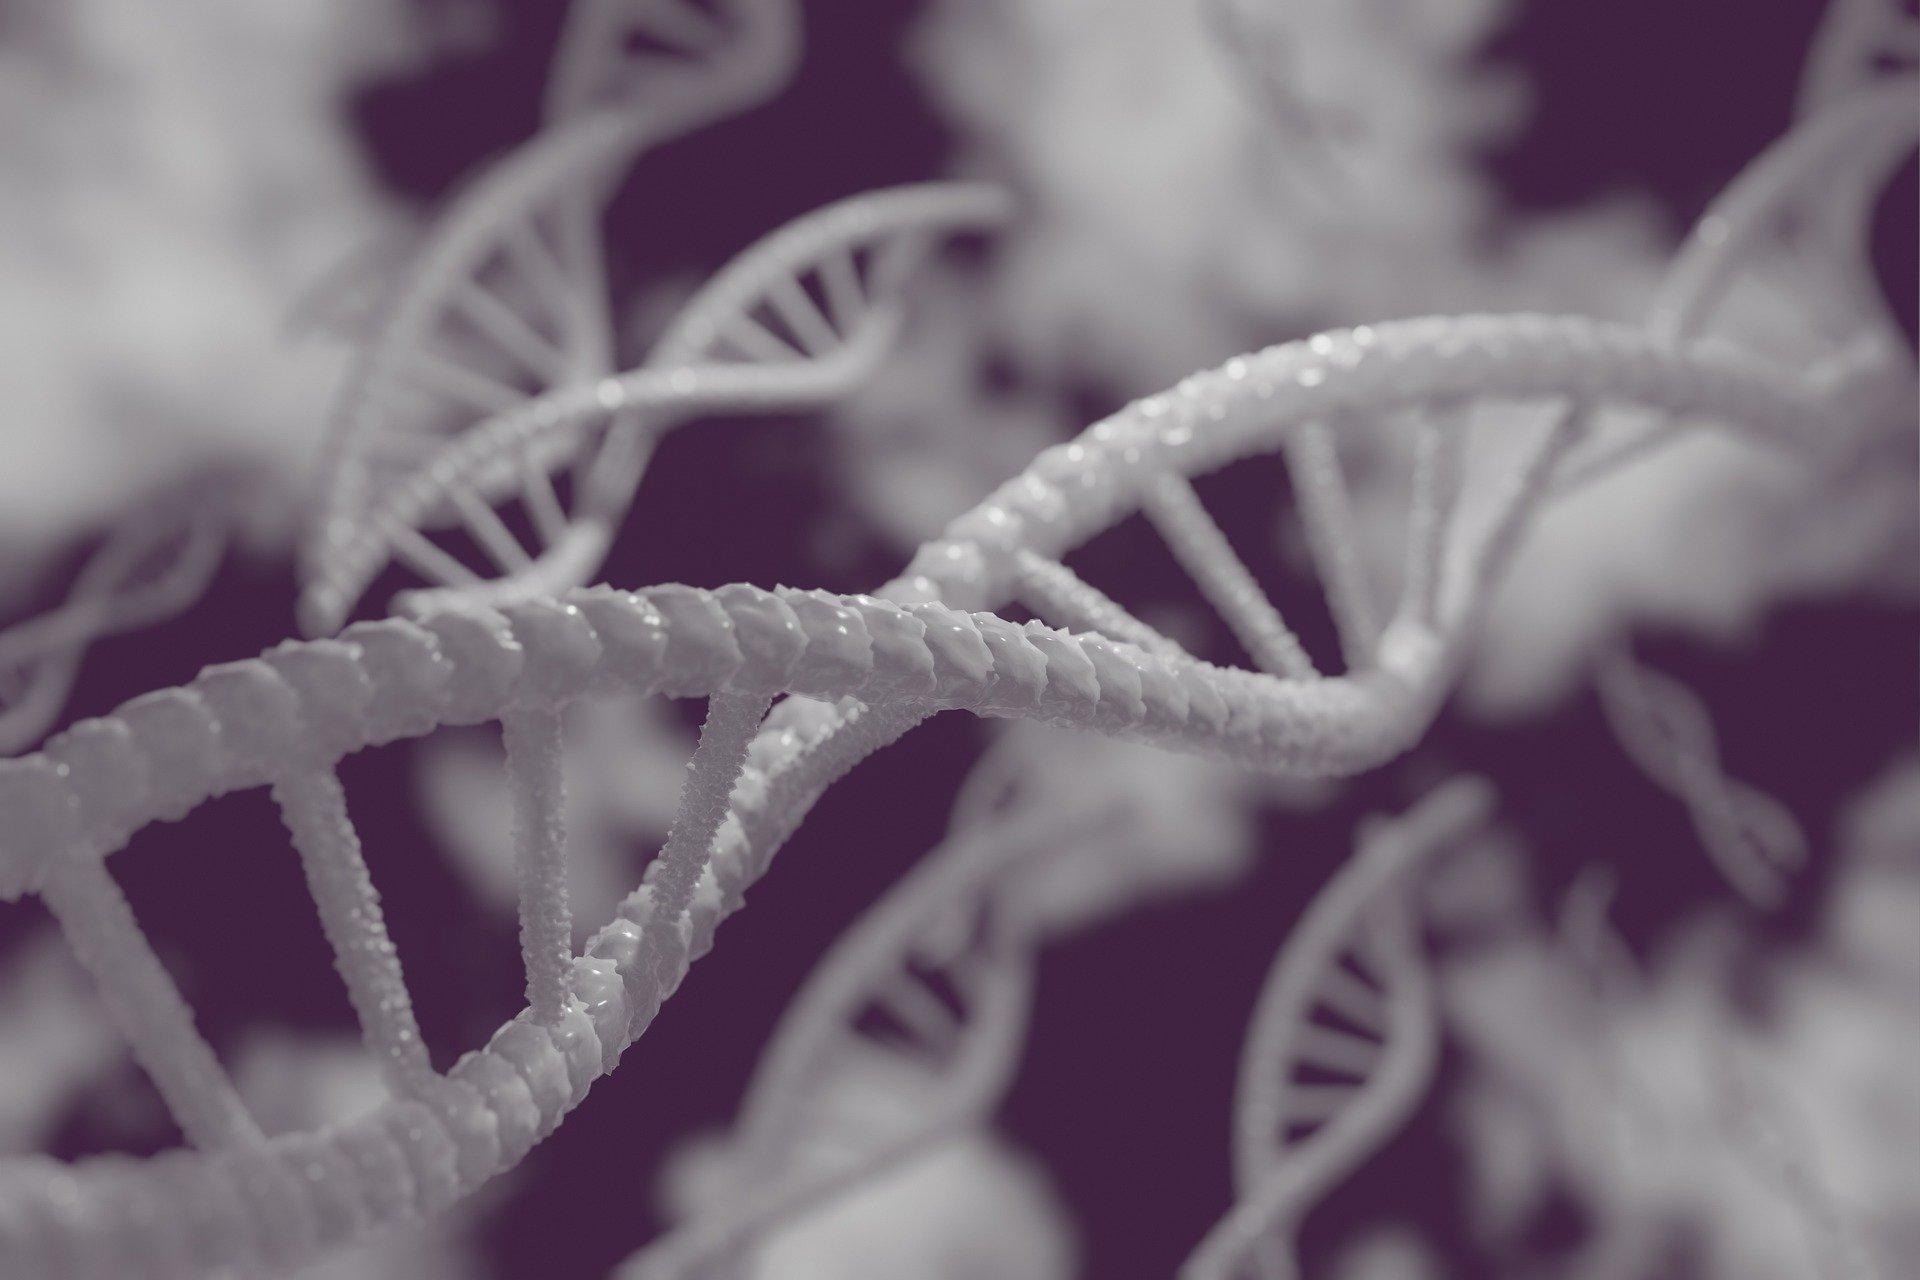 Biología molecular (ADN)